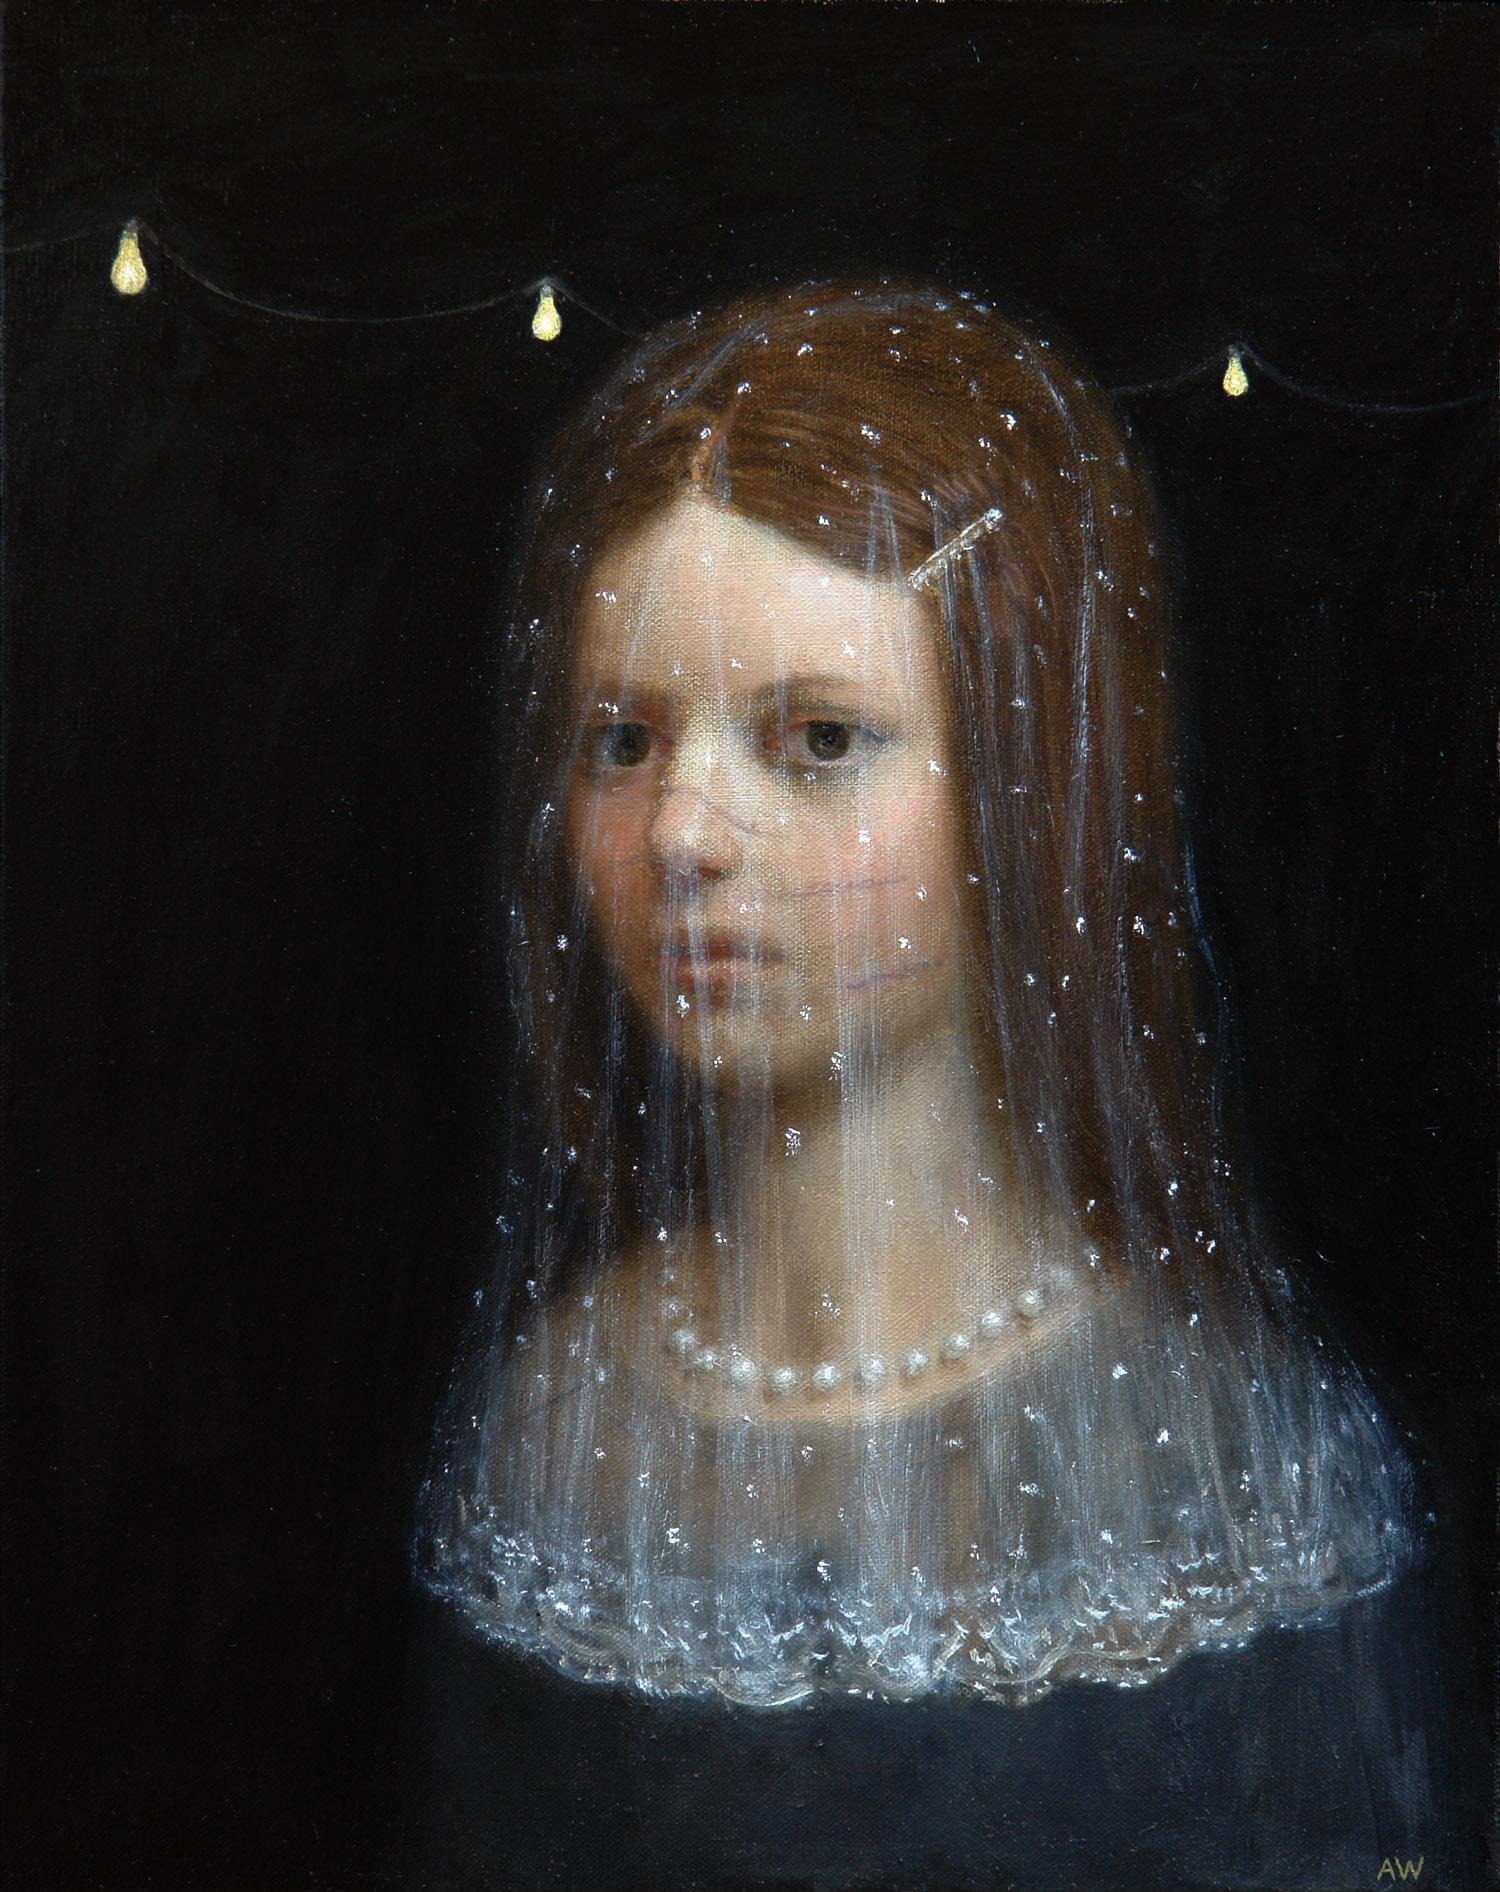 Quinceañera ,oil on canvas, 20 x 16 in / 51 x 41 cm, 2008